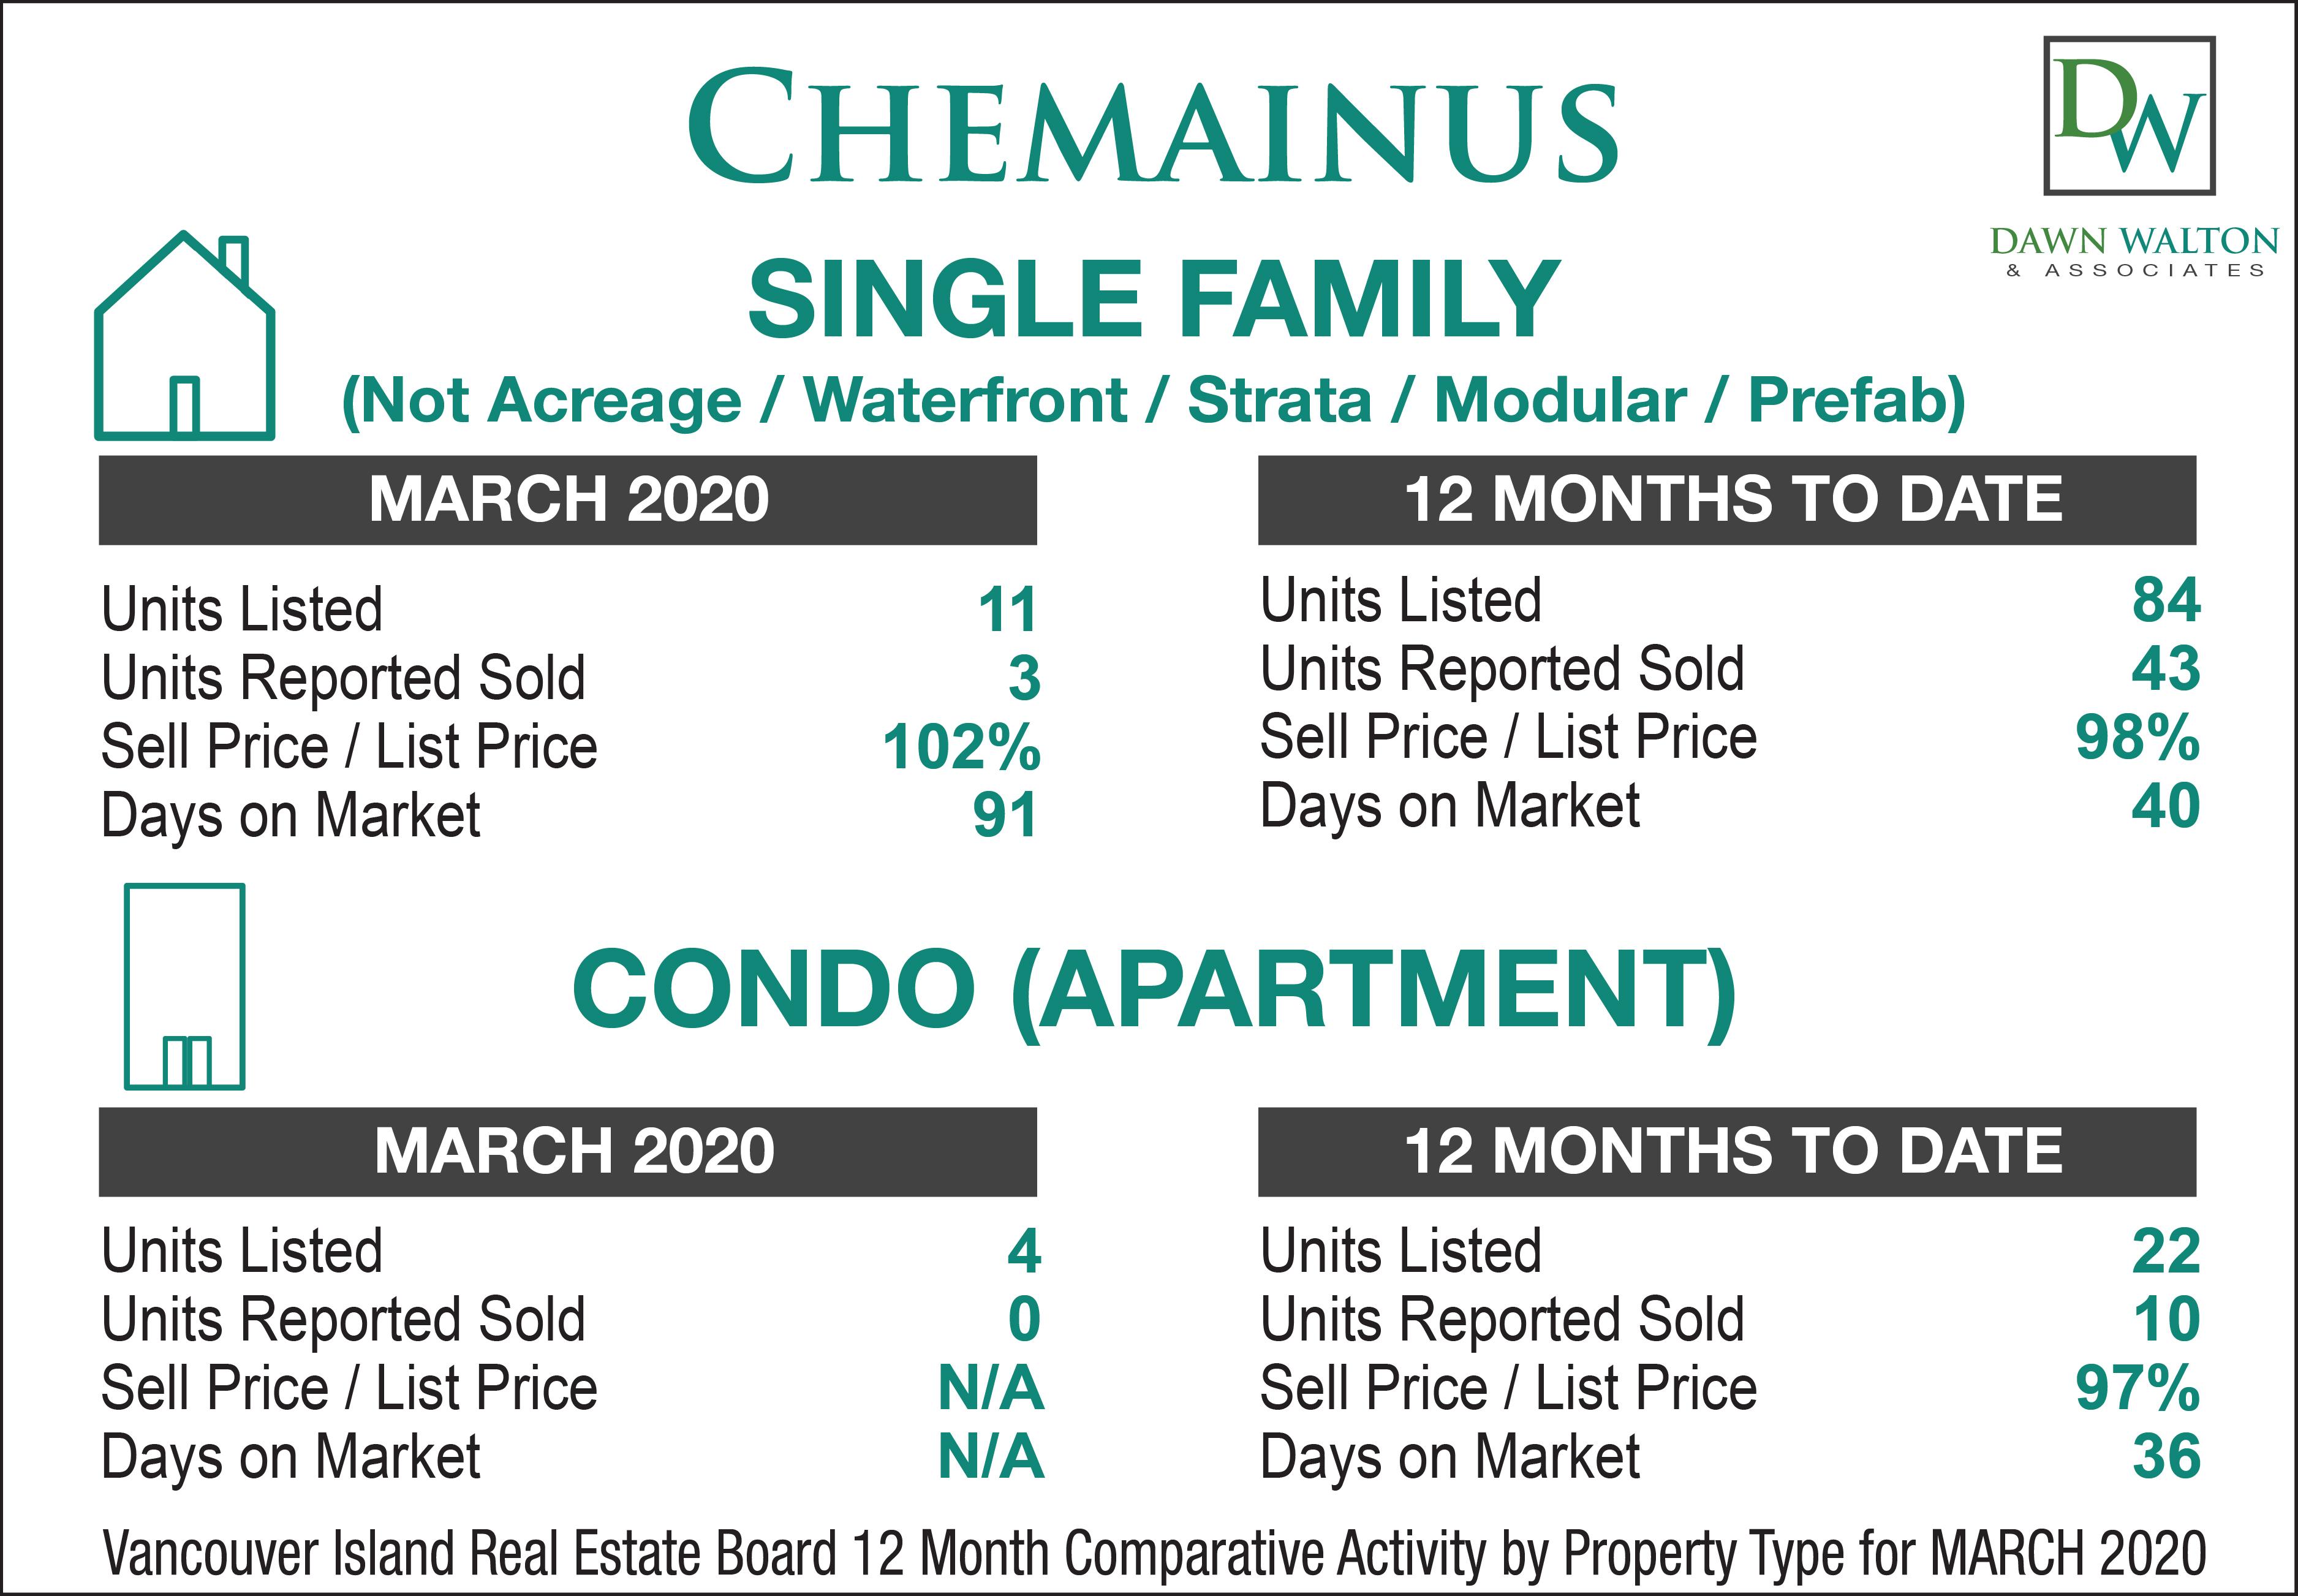 Chemainus Real Estate Market Stats March 2020 - Nanaimo Realtor Dawn Walton